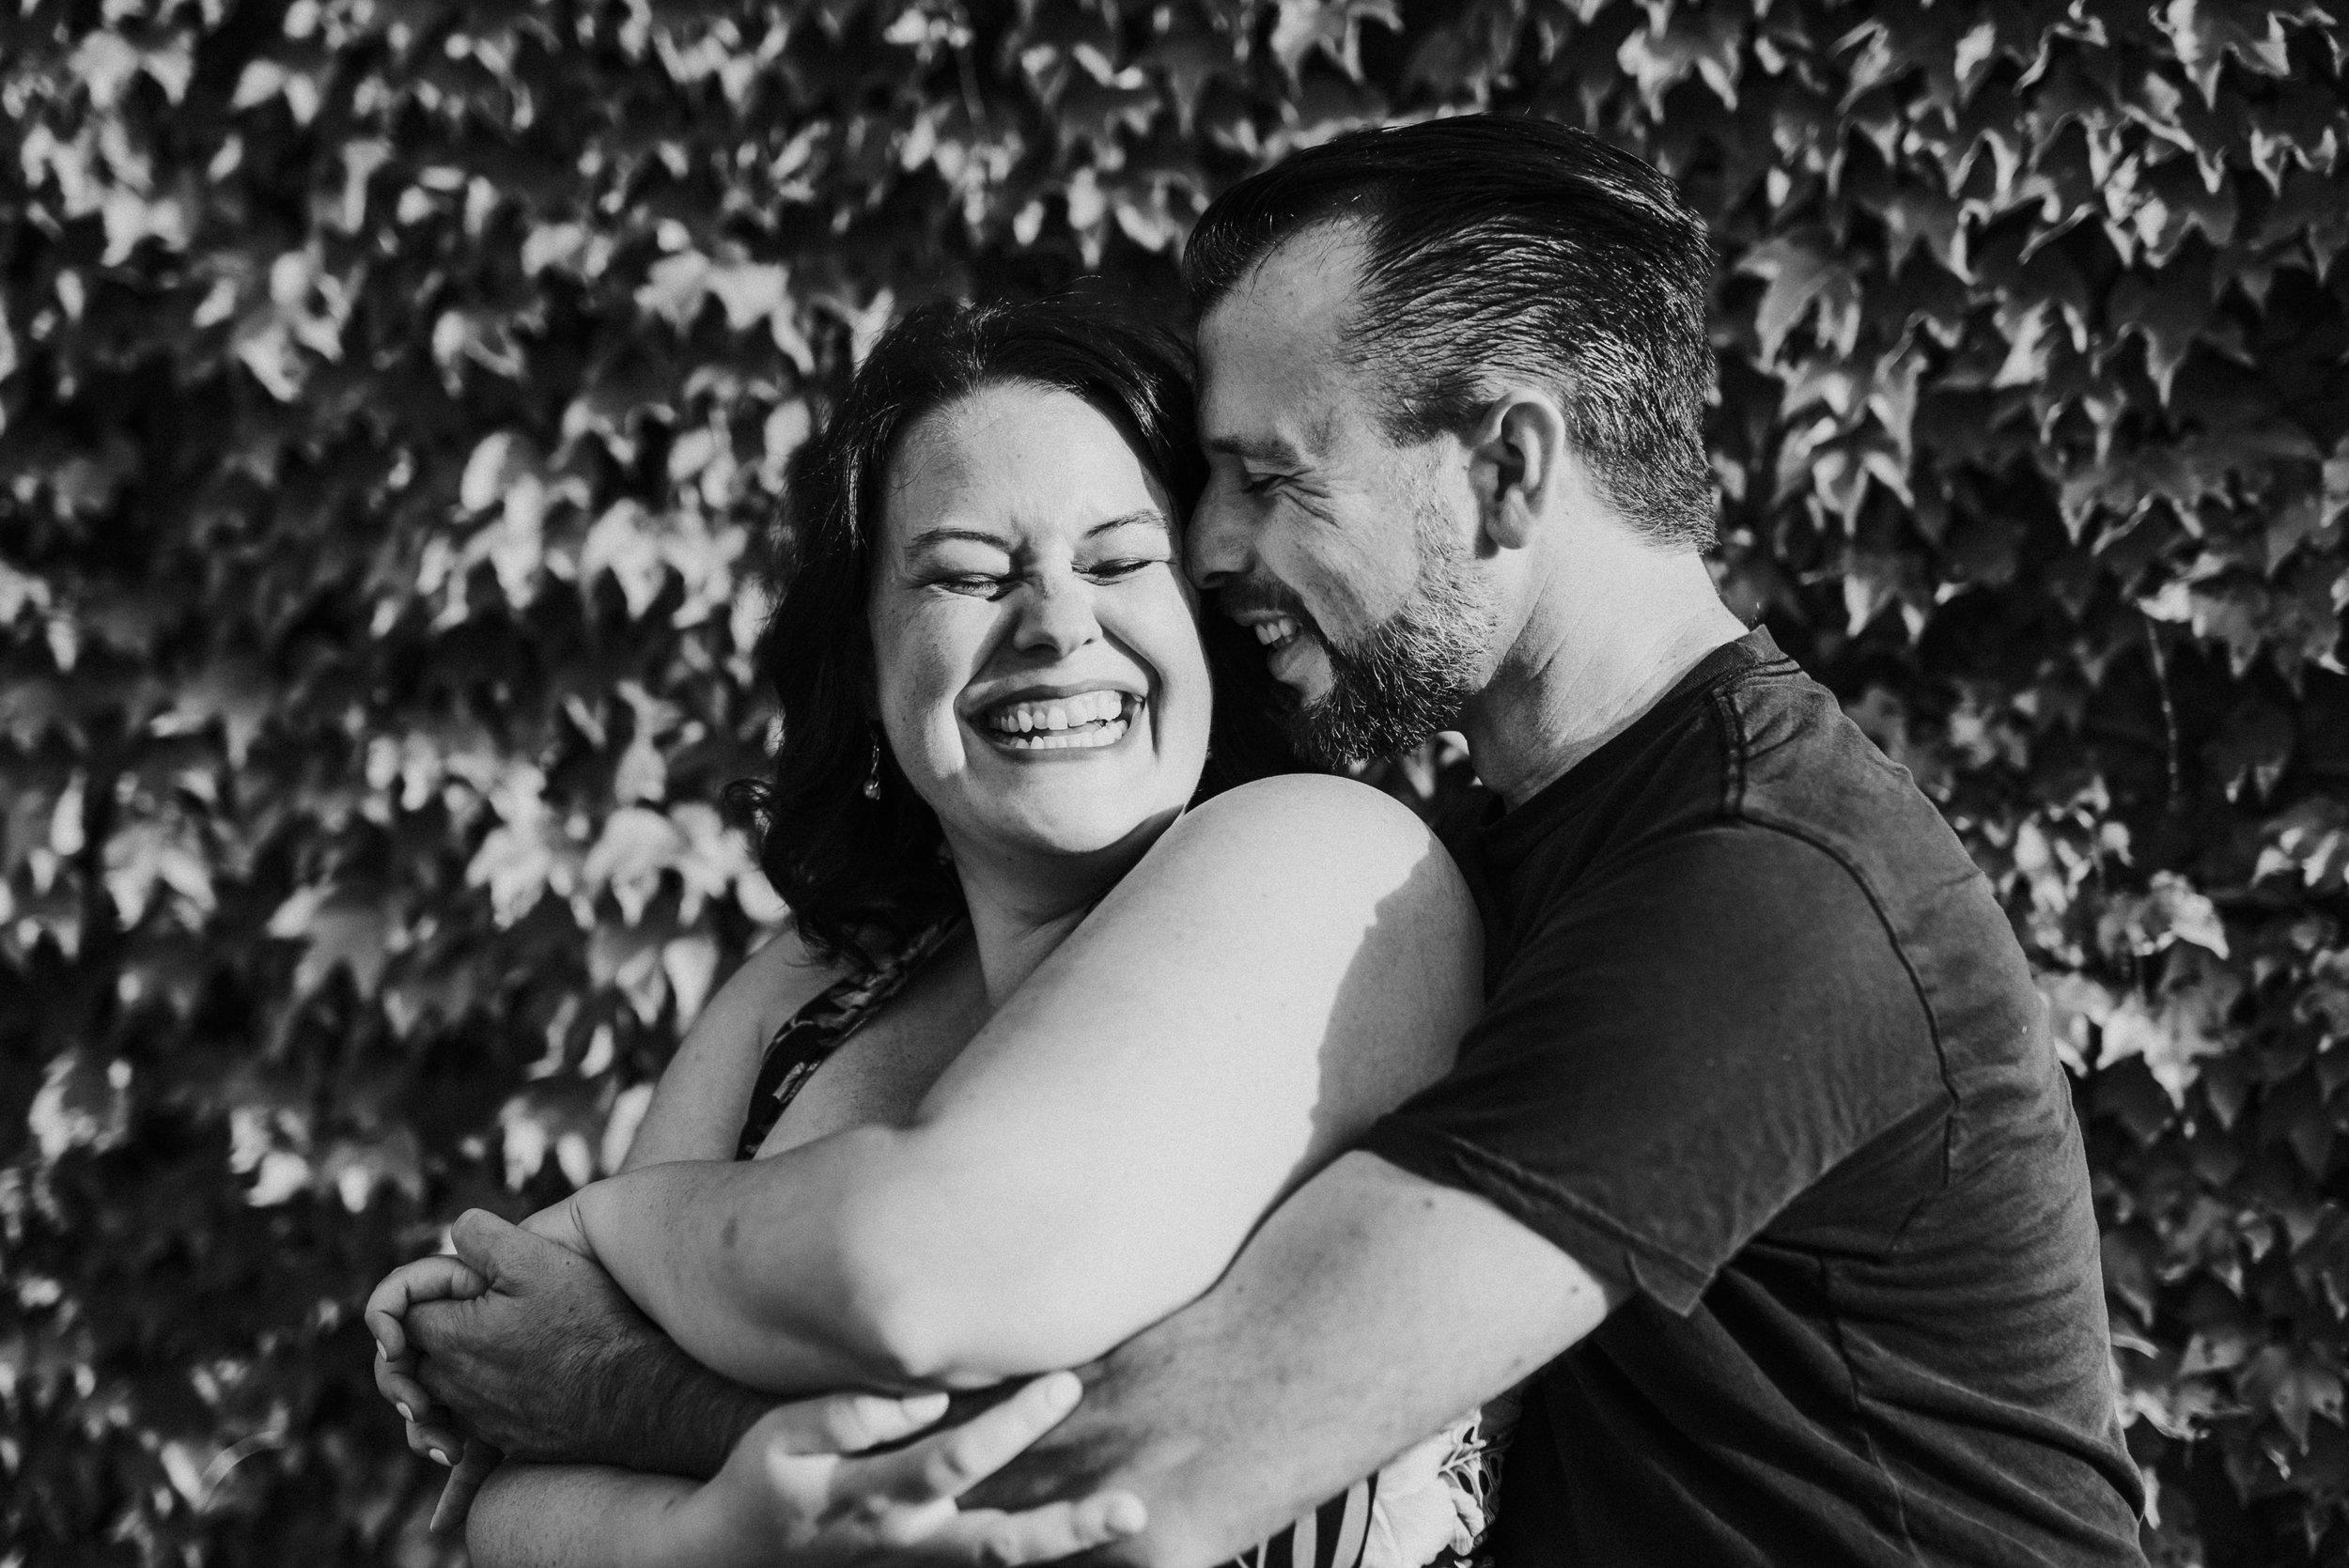 Megan & Steve_Broad Ave Engagement_Ashley Benham Photography-36.jpg